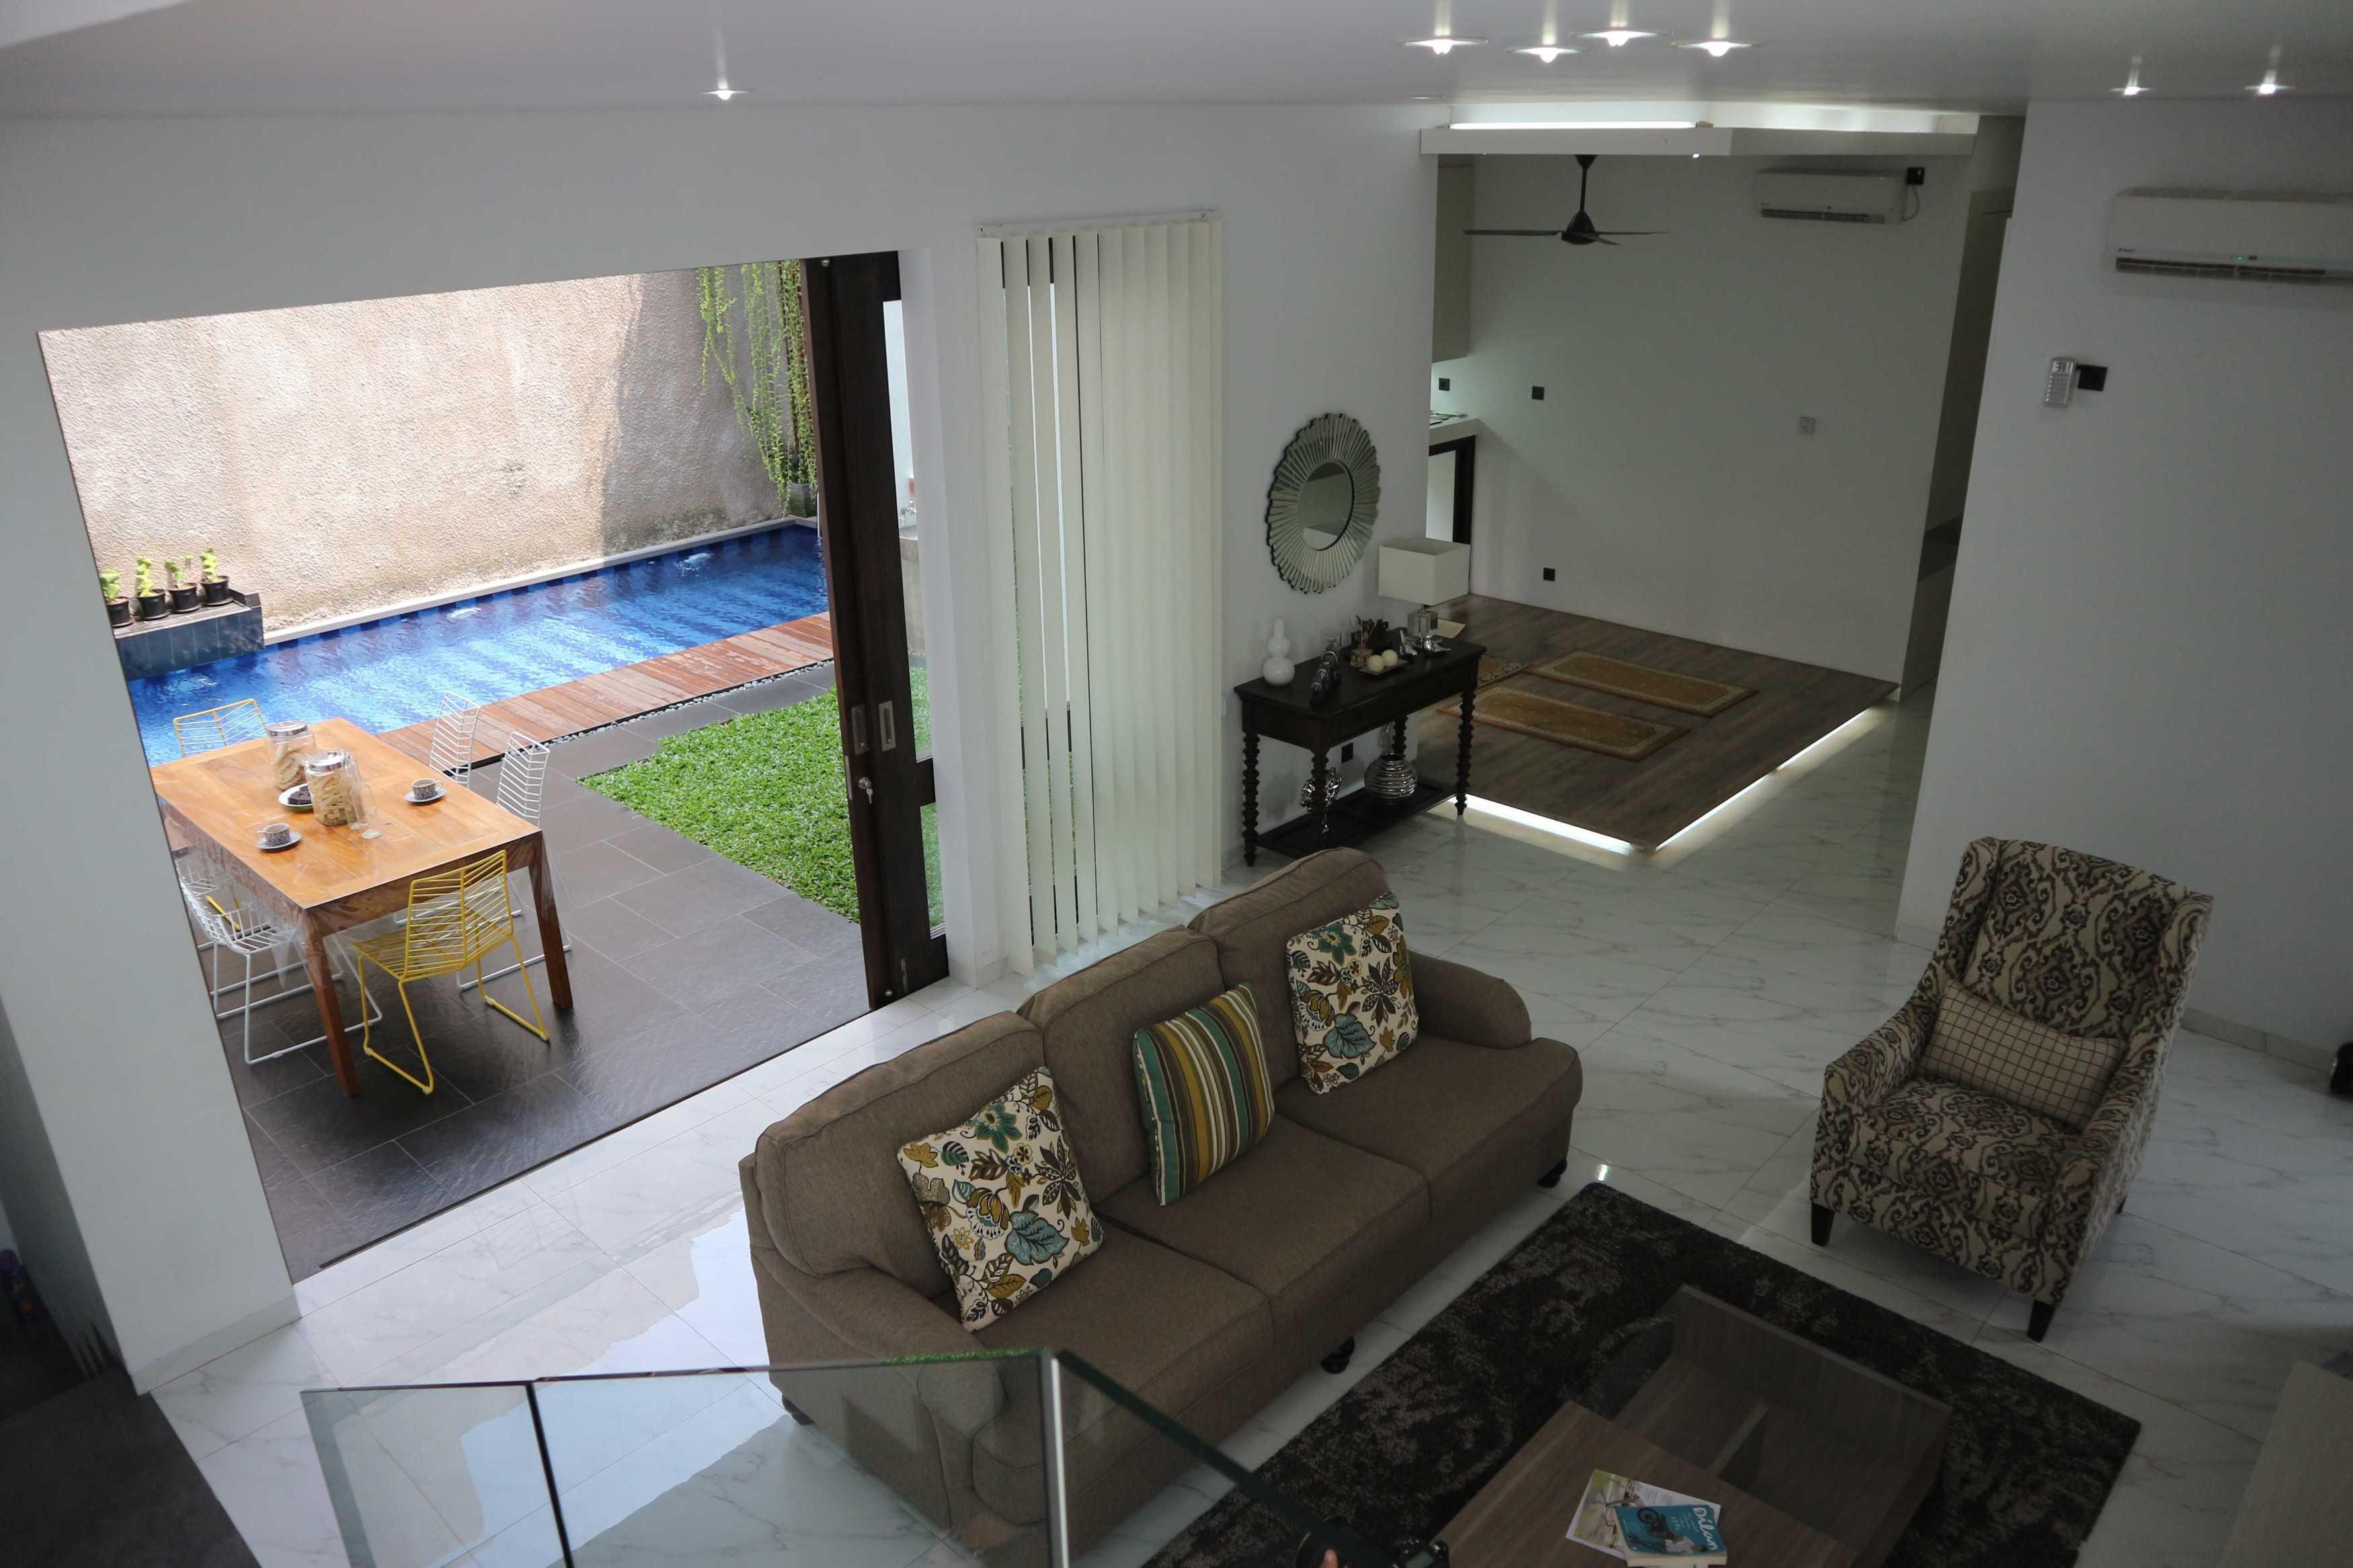 Jerry M. Febrino Rs House Jl. Pesona Paris, Ciangsana, Gn. Putri, Bogor, Jawa Barat 16968, Indonesia Kota Wisata Img3450 Modern  38109